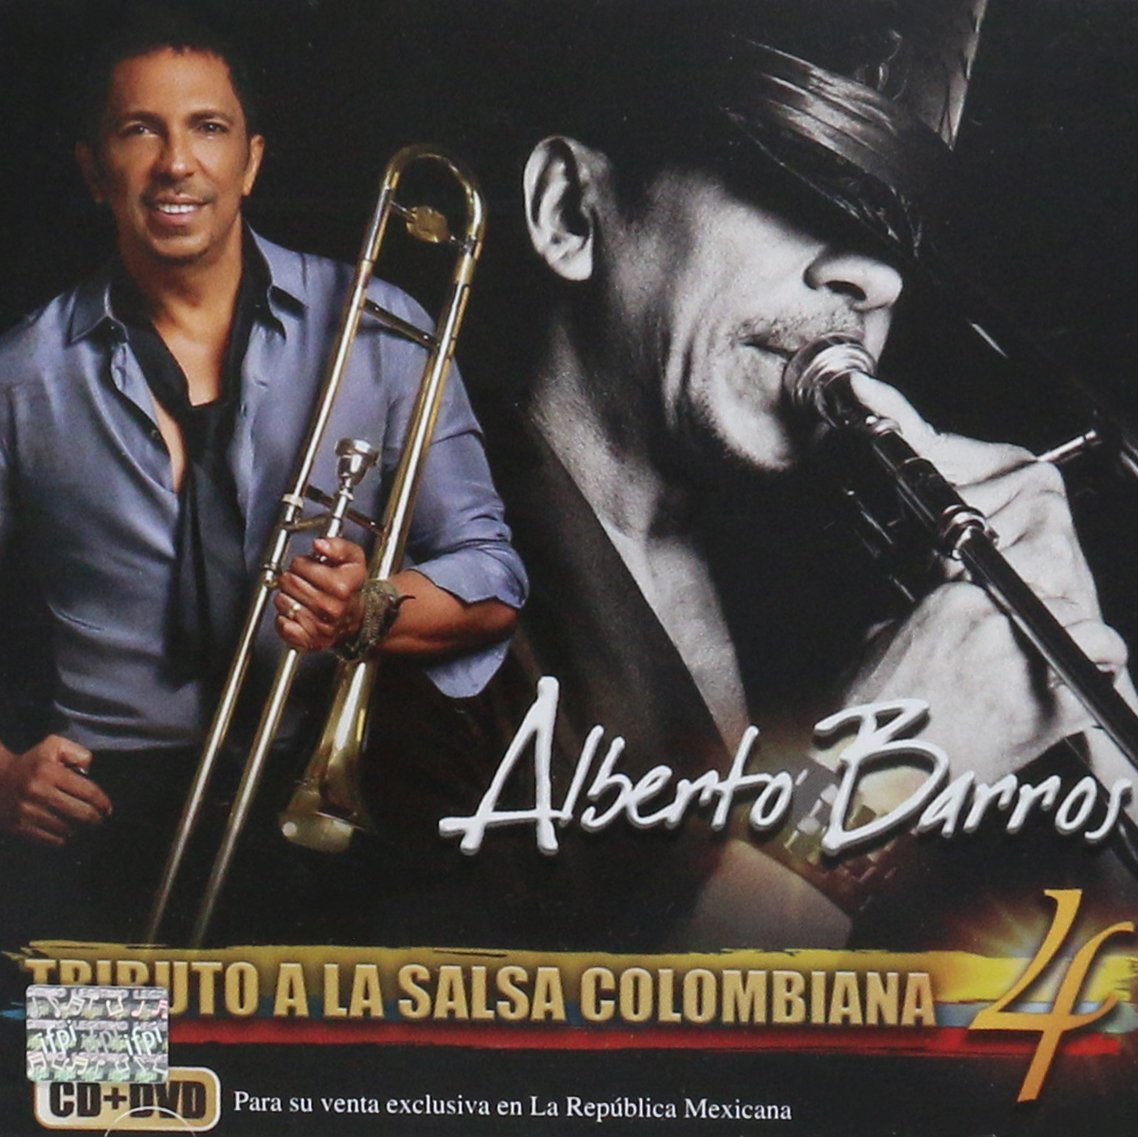 Tributo a La Salsa Colombiana 4 Cd+dvd by Fonovisa